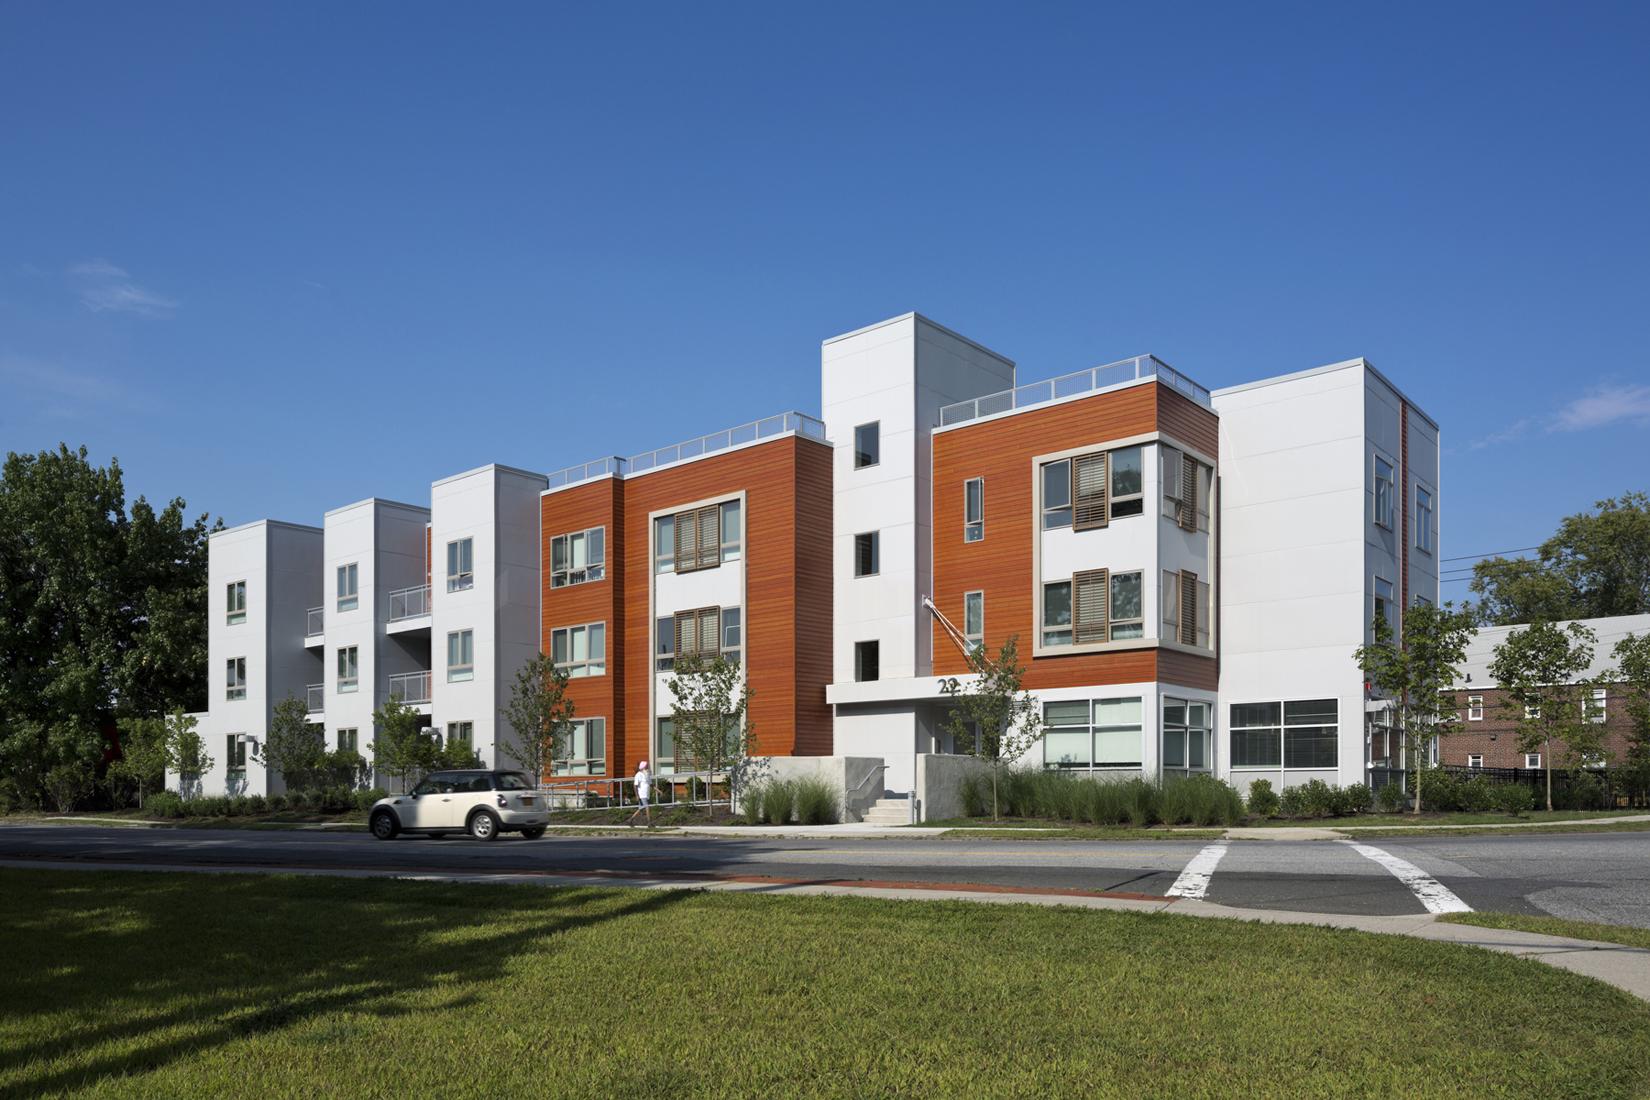 22 Tarrytown Workforce Housing Architect Magazine